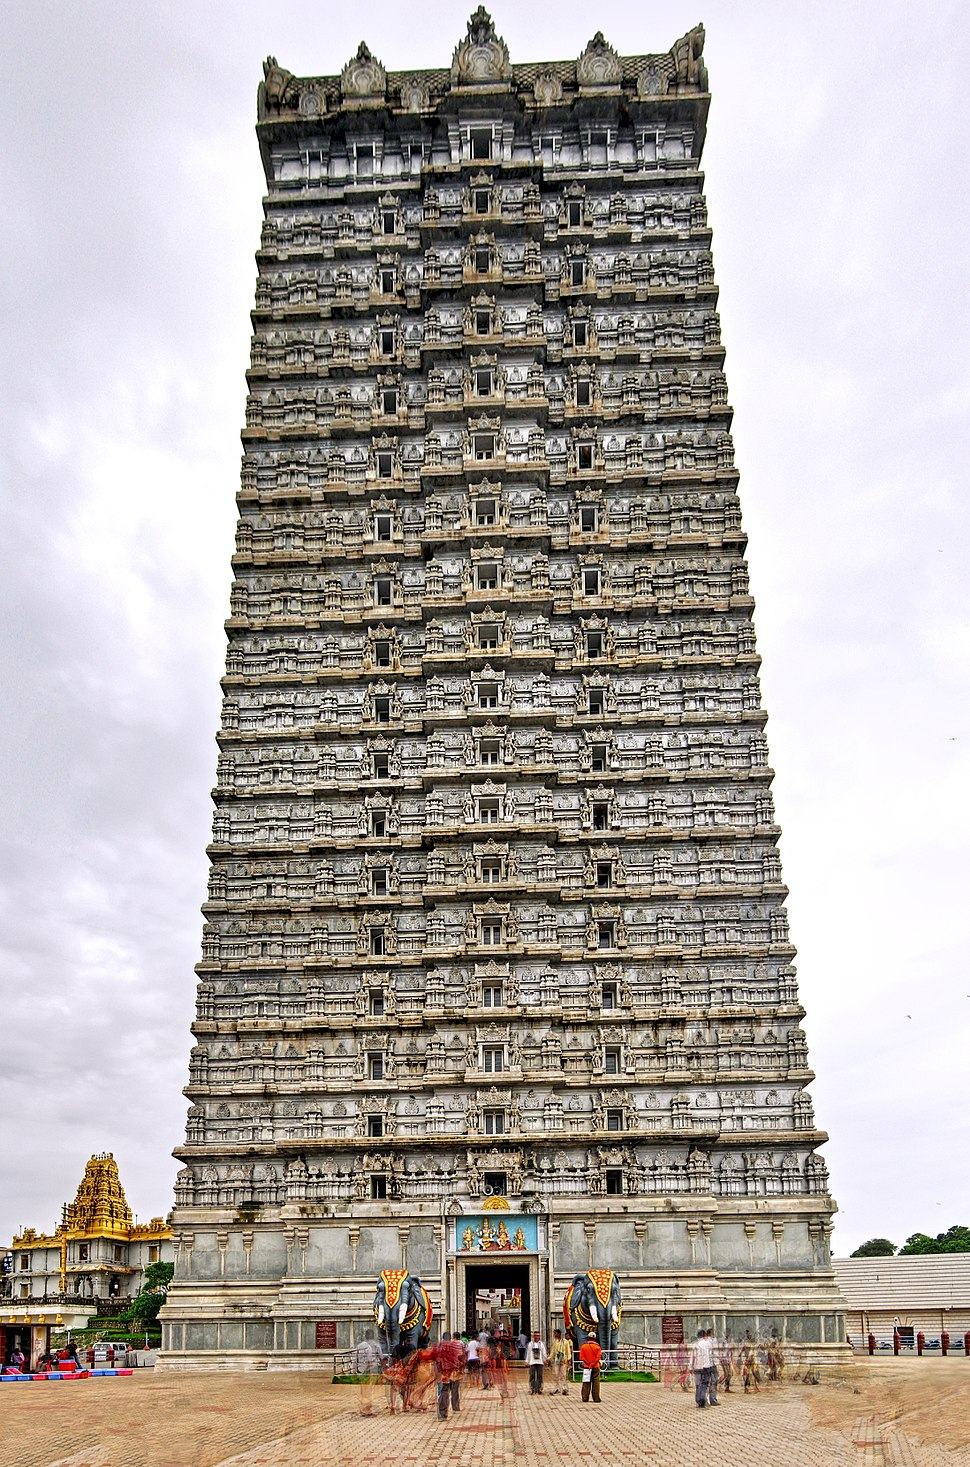 Murudeshwara raja gopura HDR, Jul 2012